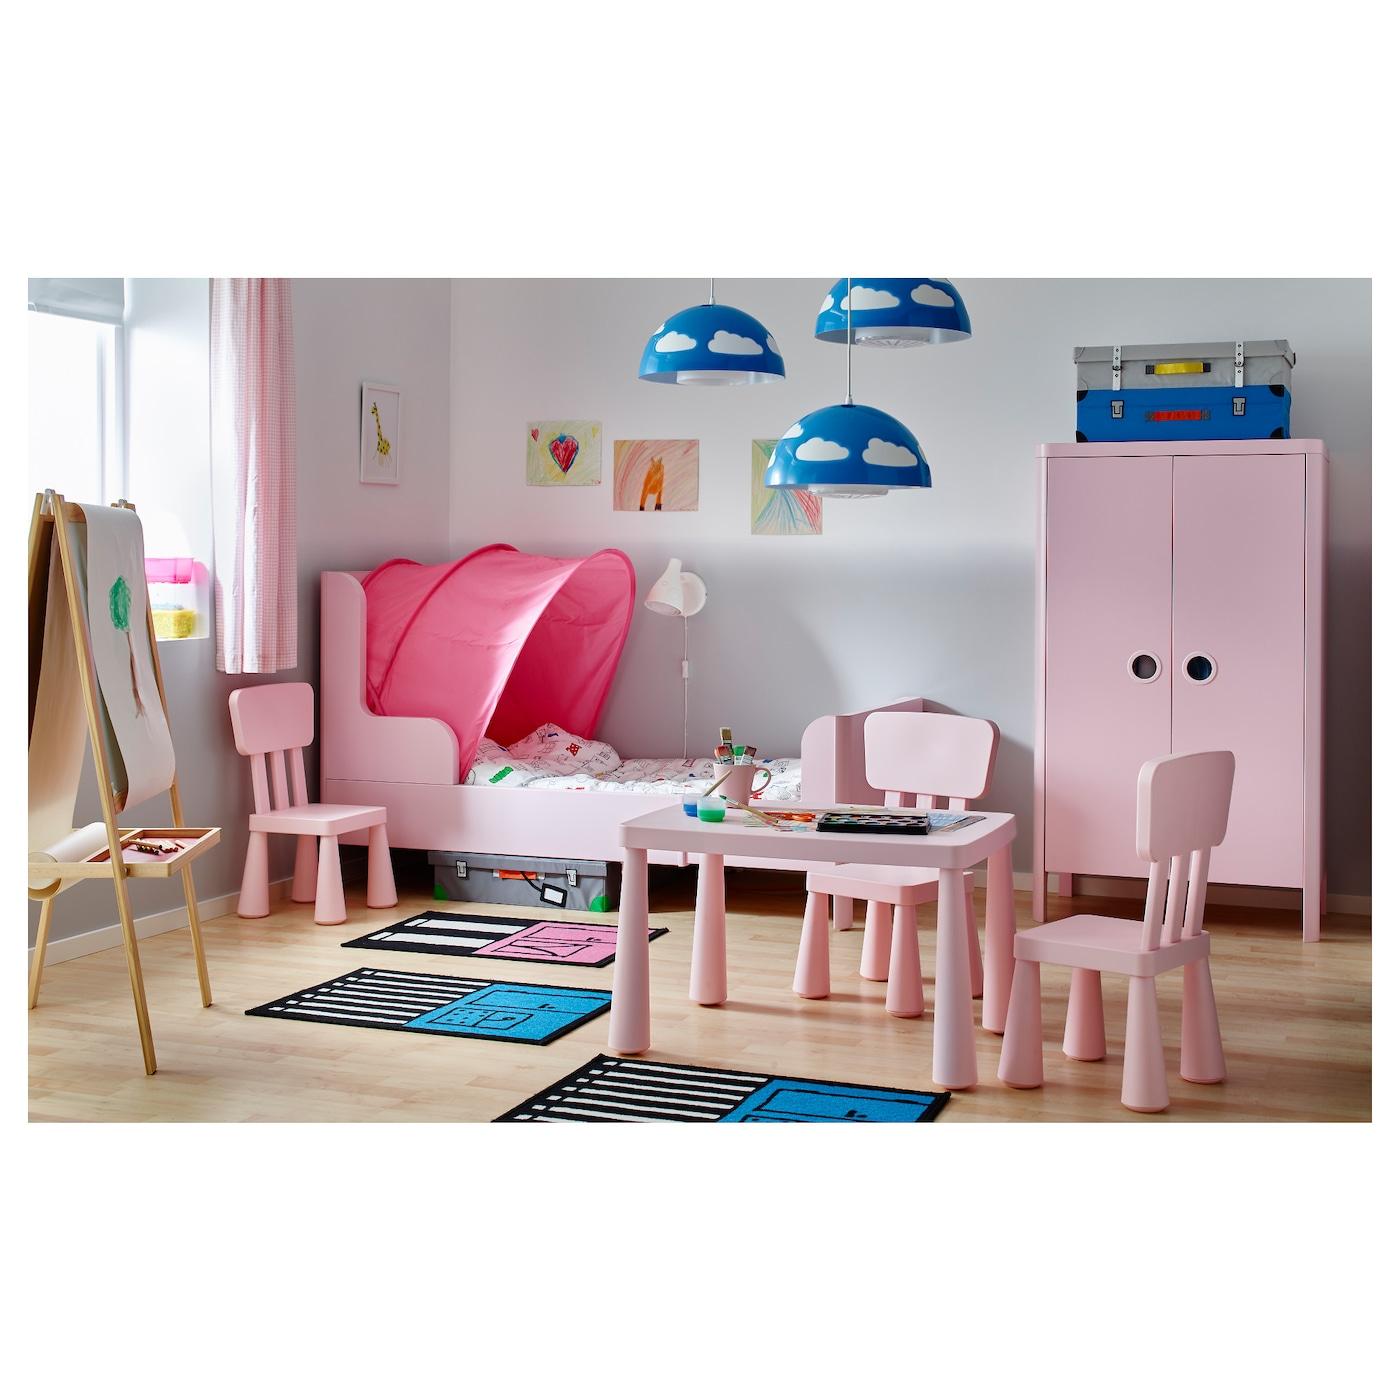 busunge extendable bed light pink 80x200 cm ikea. Black Bedroom Furniture Sets. Home Design Ideas